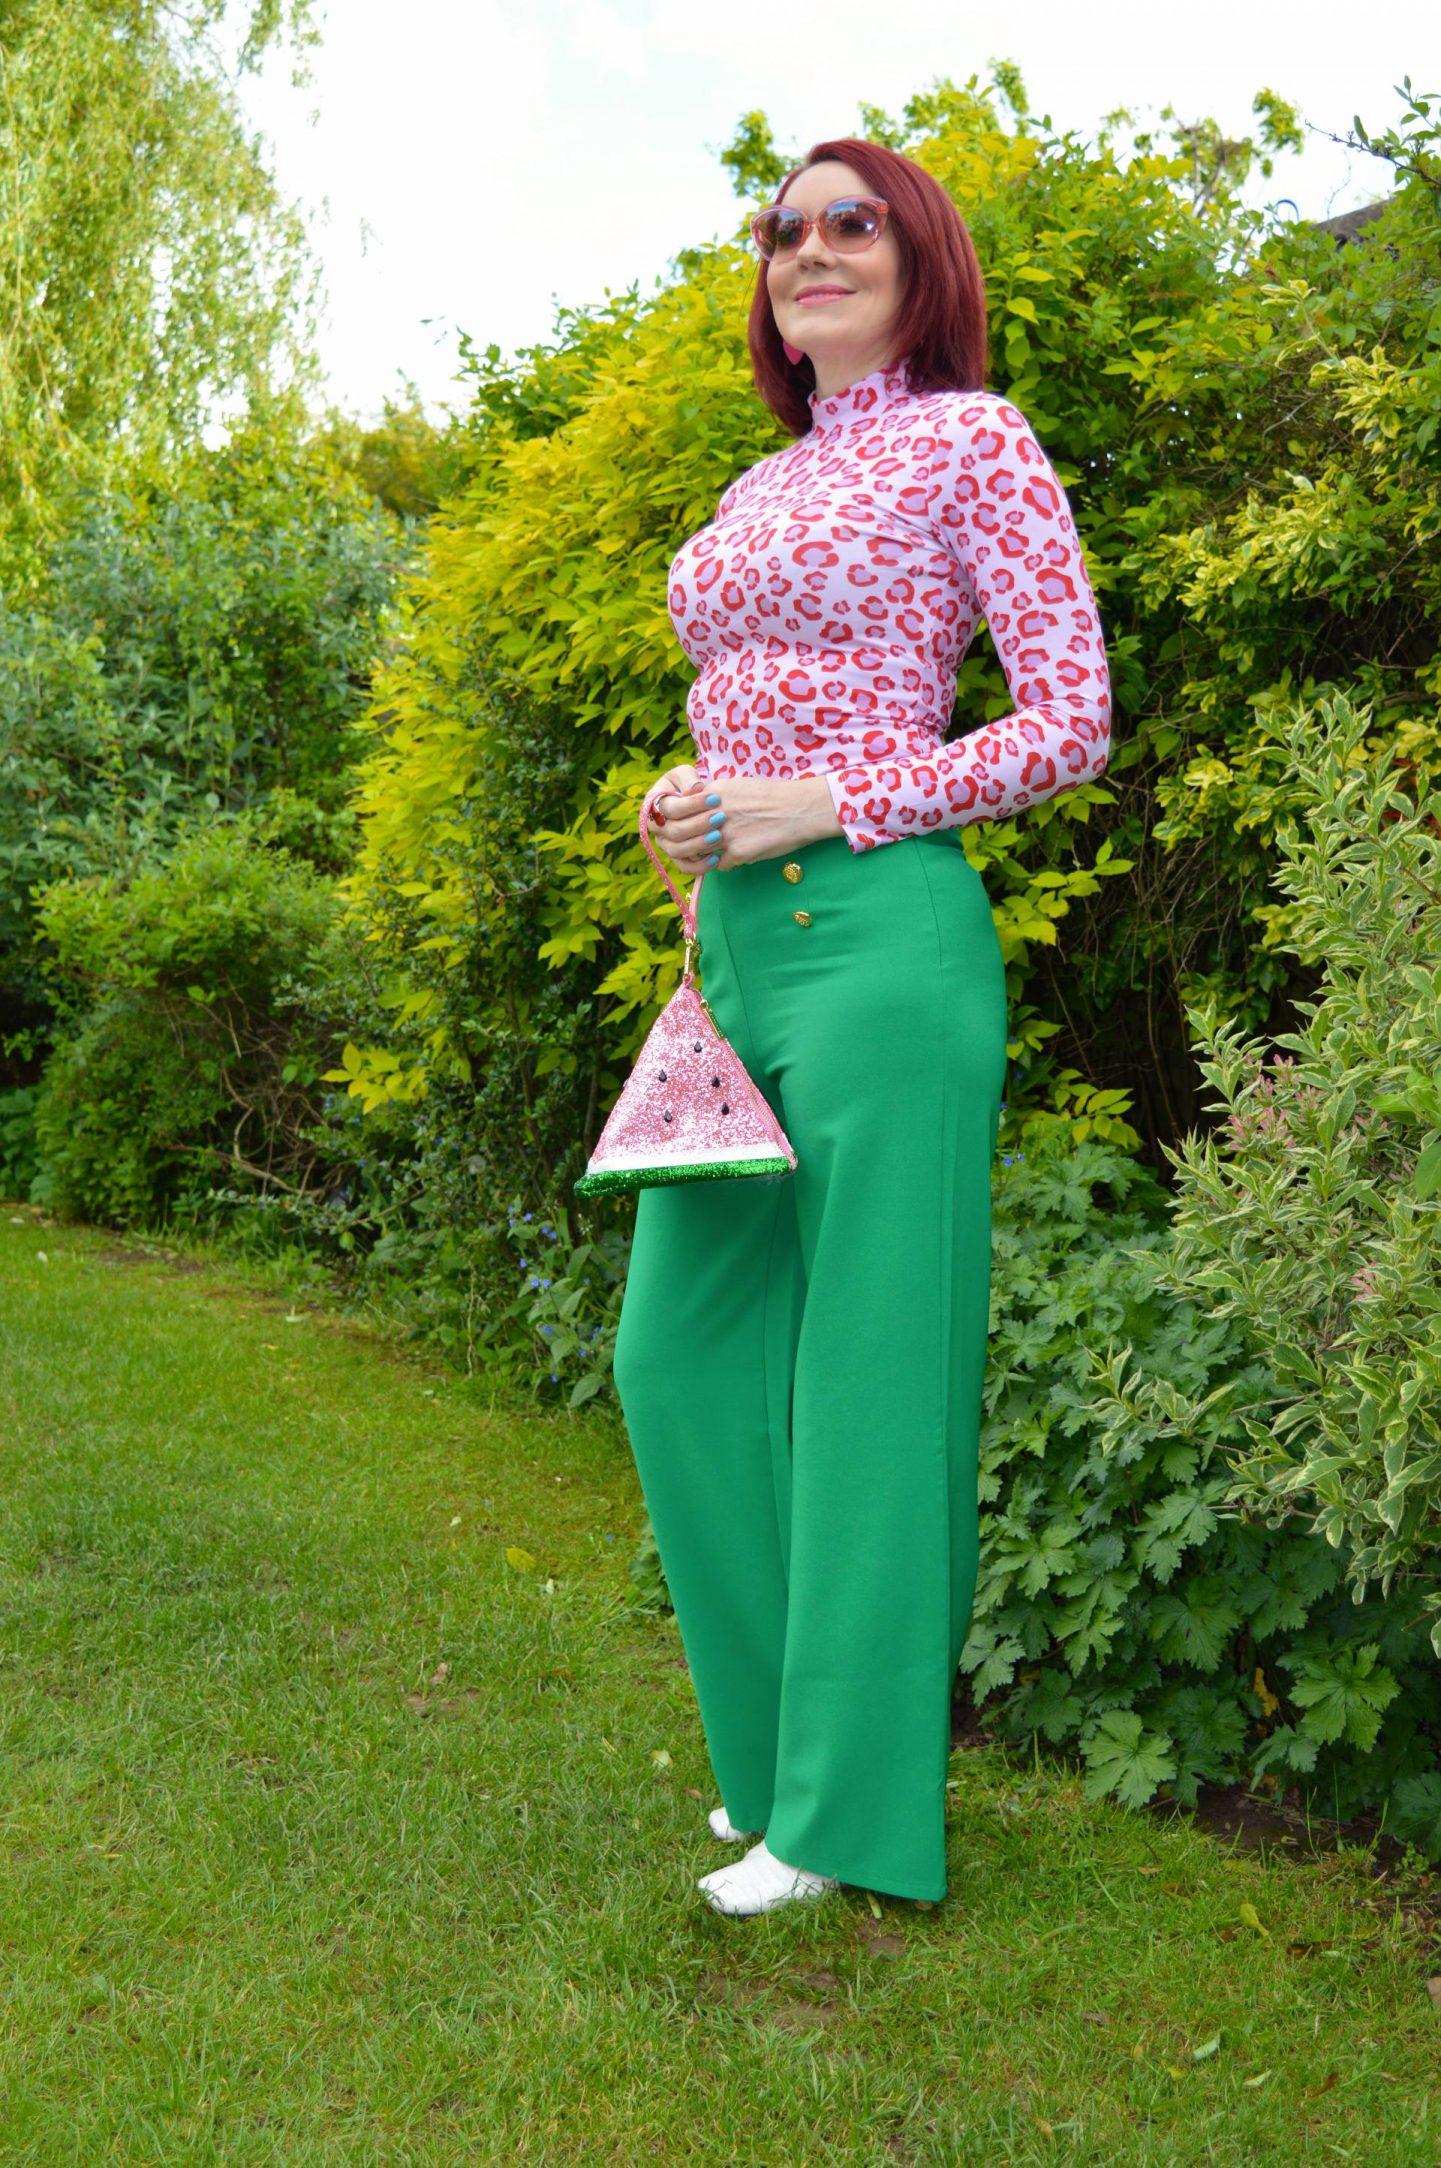 Green and Pink Animal Print, Saturday by Megan Ellaby Hazel pink animal print top, Skinny Dip glitter warermelon bag, Flounce emerald green trousers